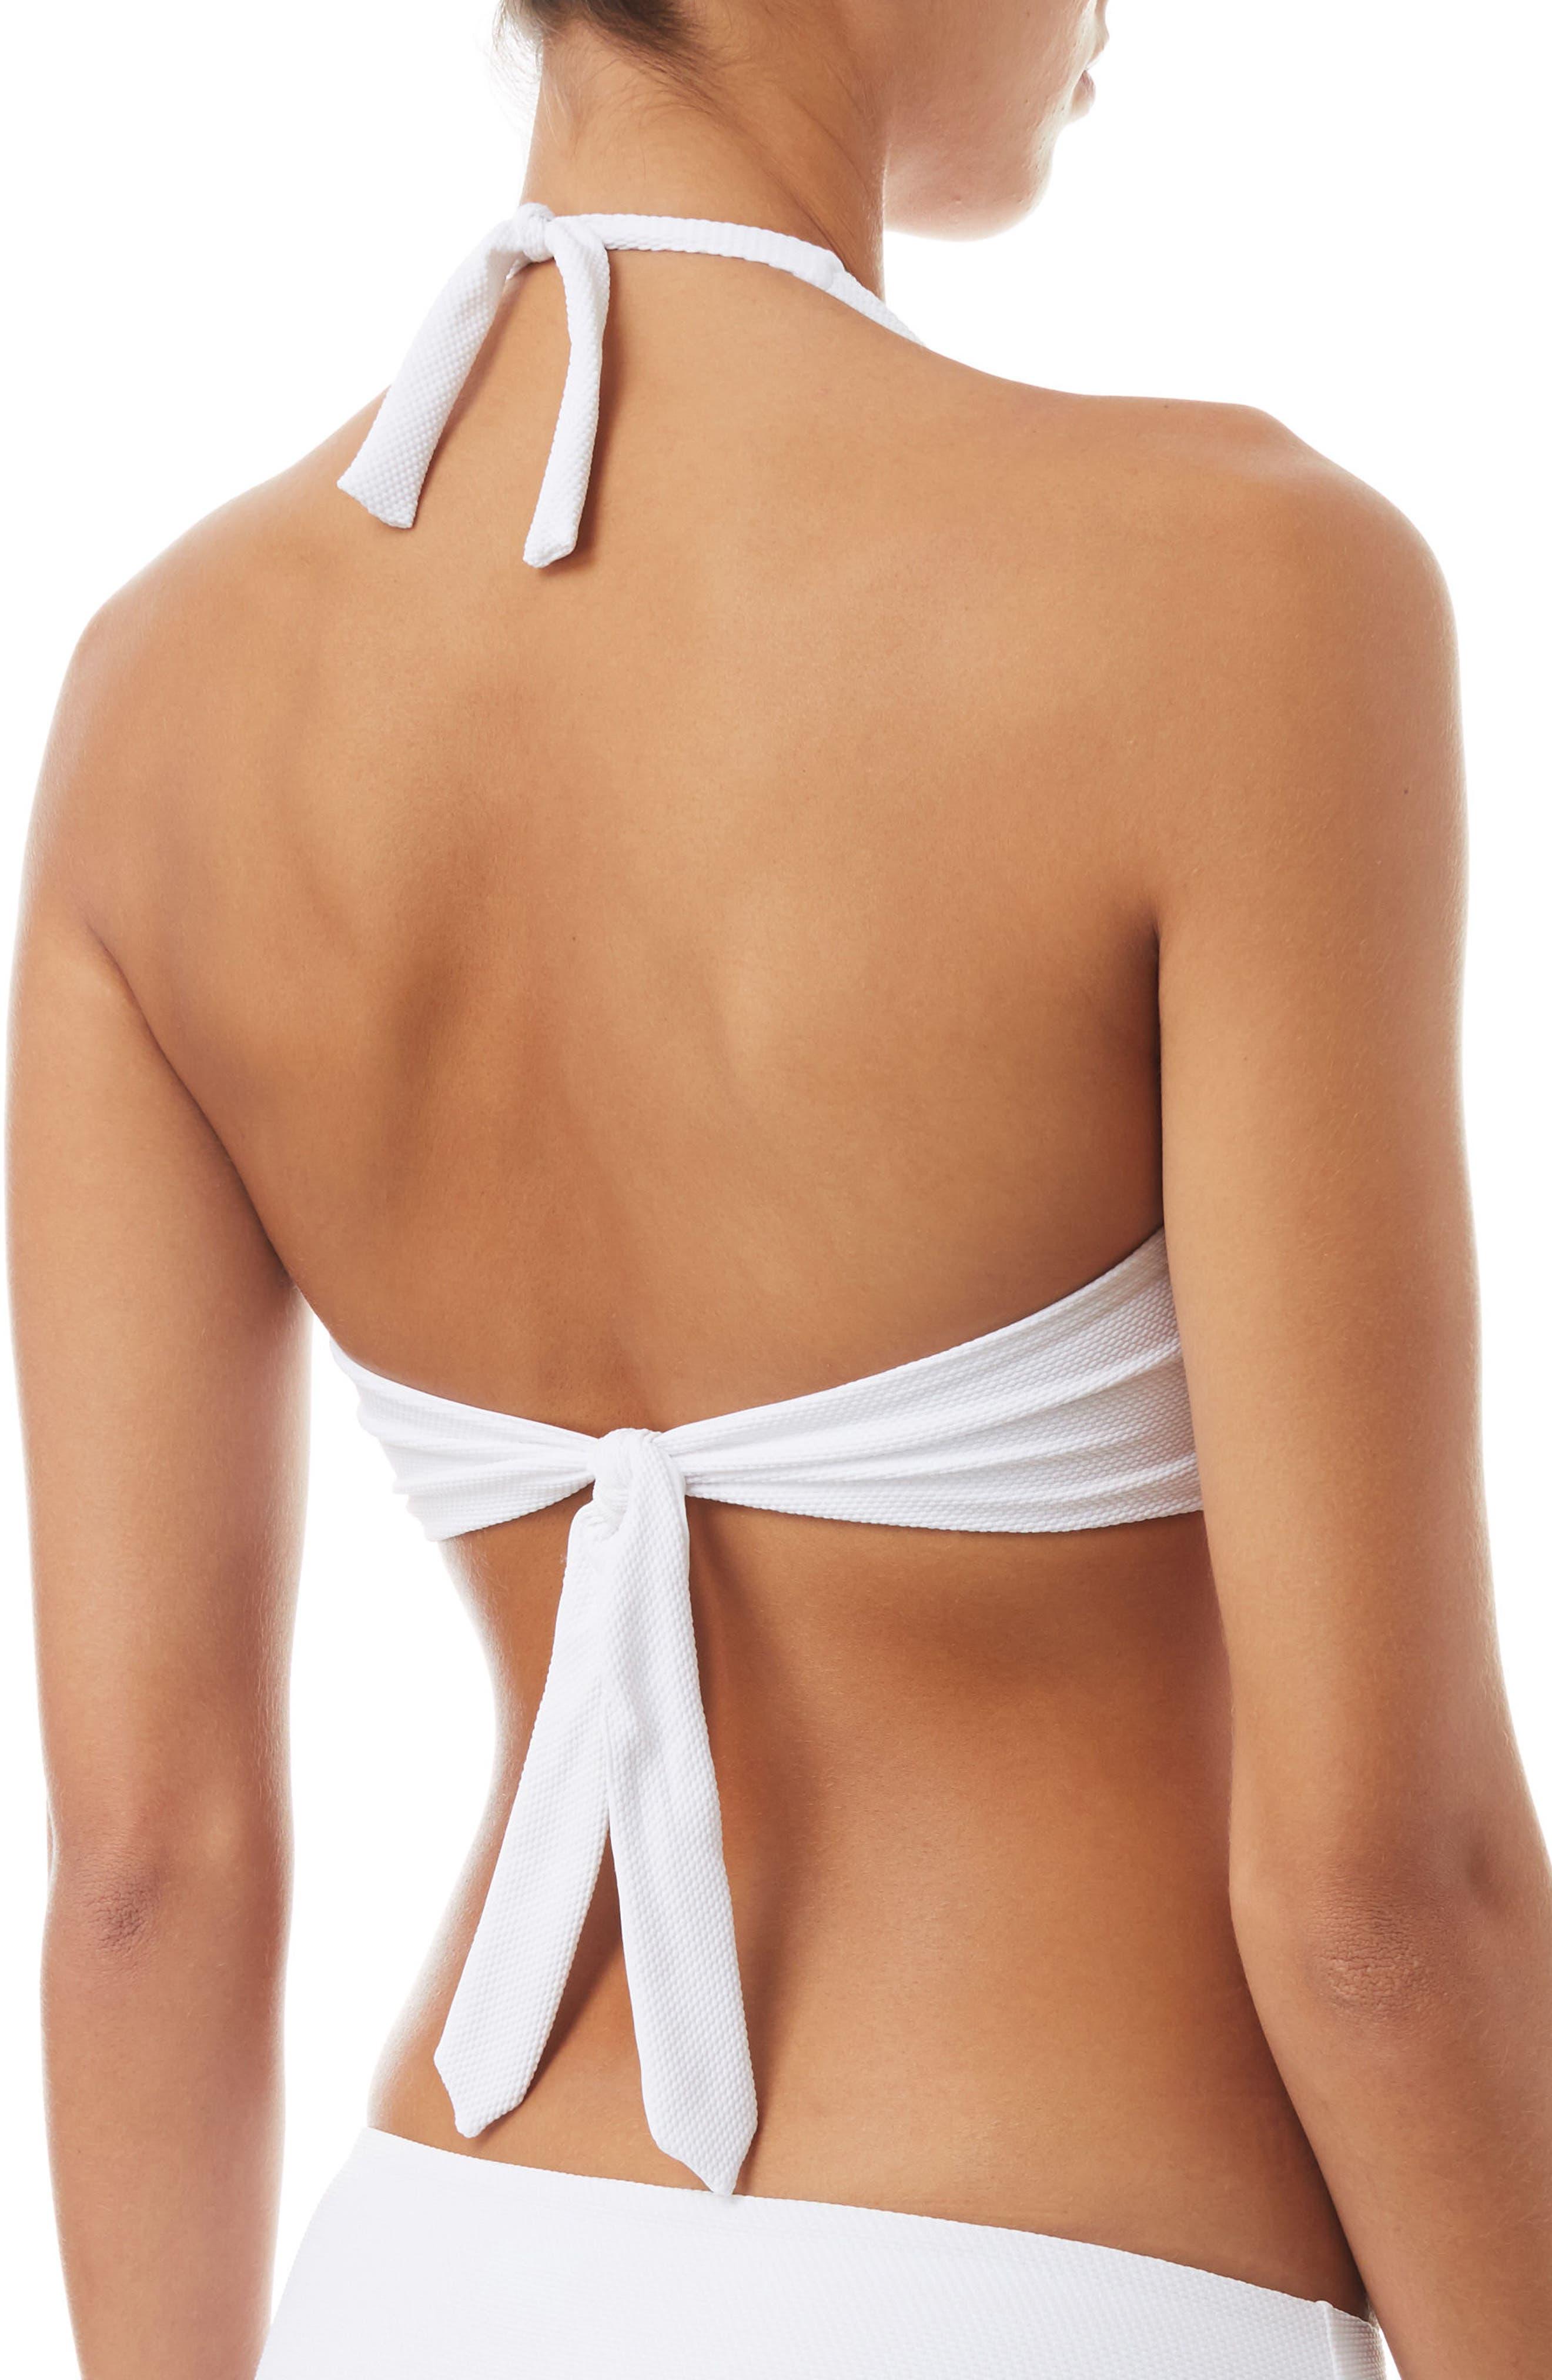 Africa Halter Bikini Top,                             Alternate thumbnail 2, color,                             PIQUE WHITE